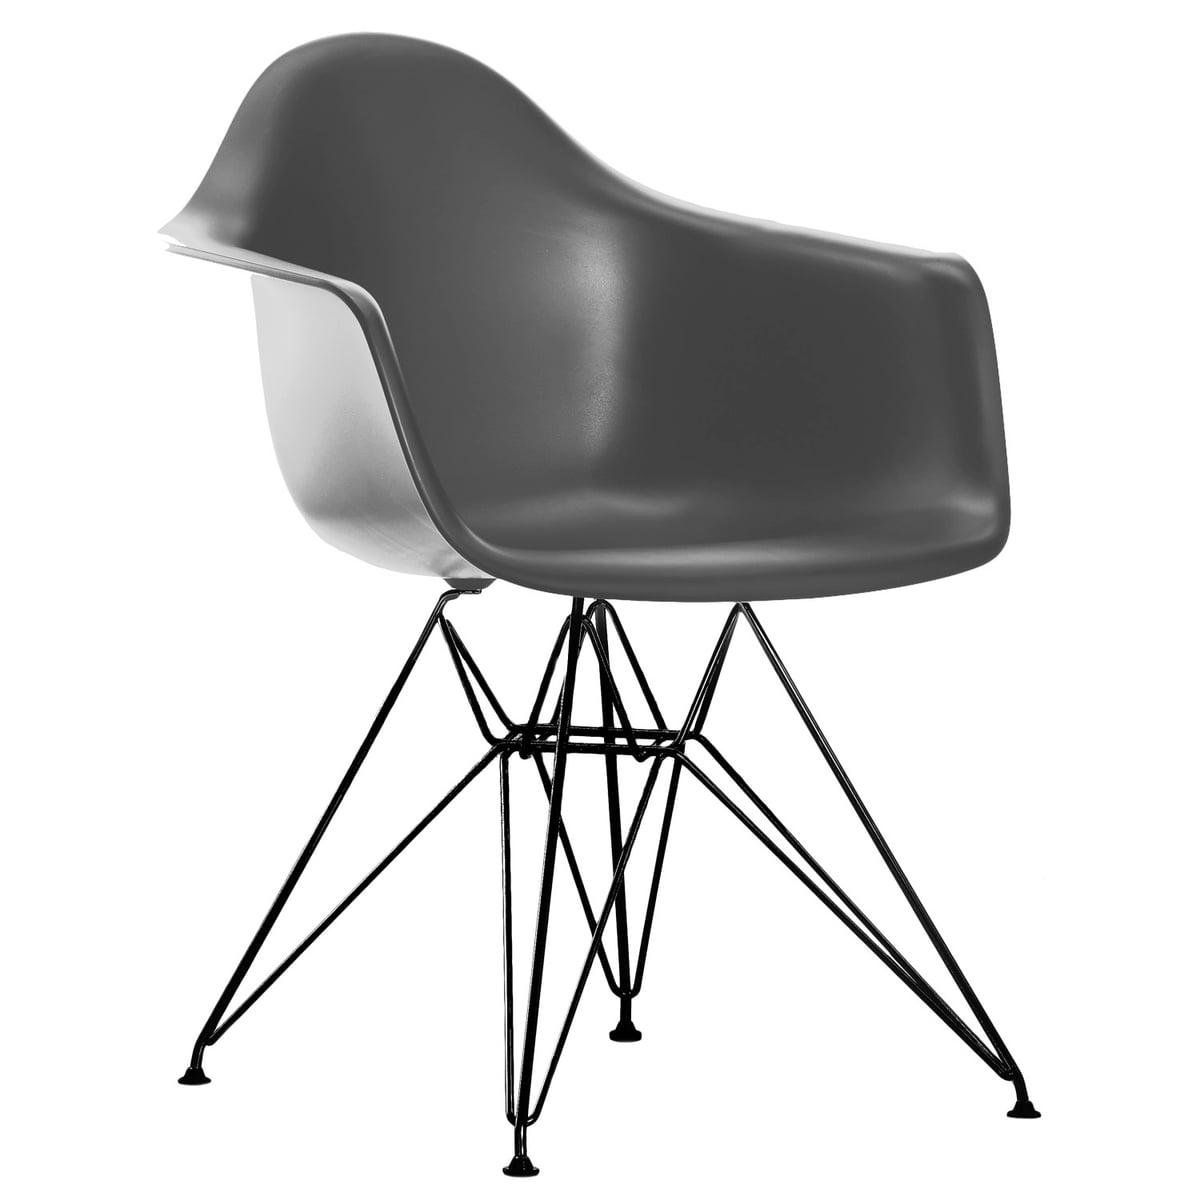 Eames Plastic Armchair DAR (H 41,5 cm), schwarz / basalt, Filzgleiter